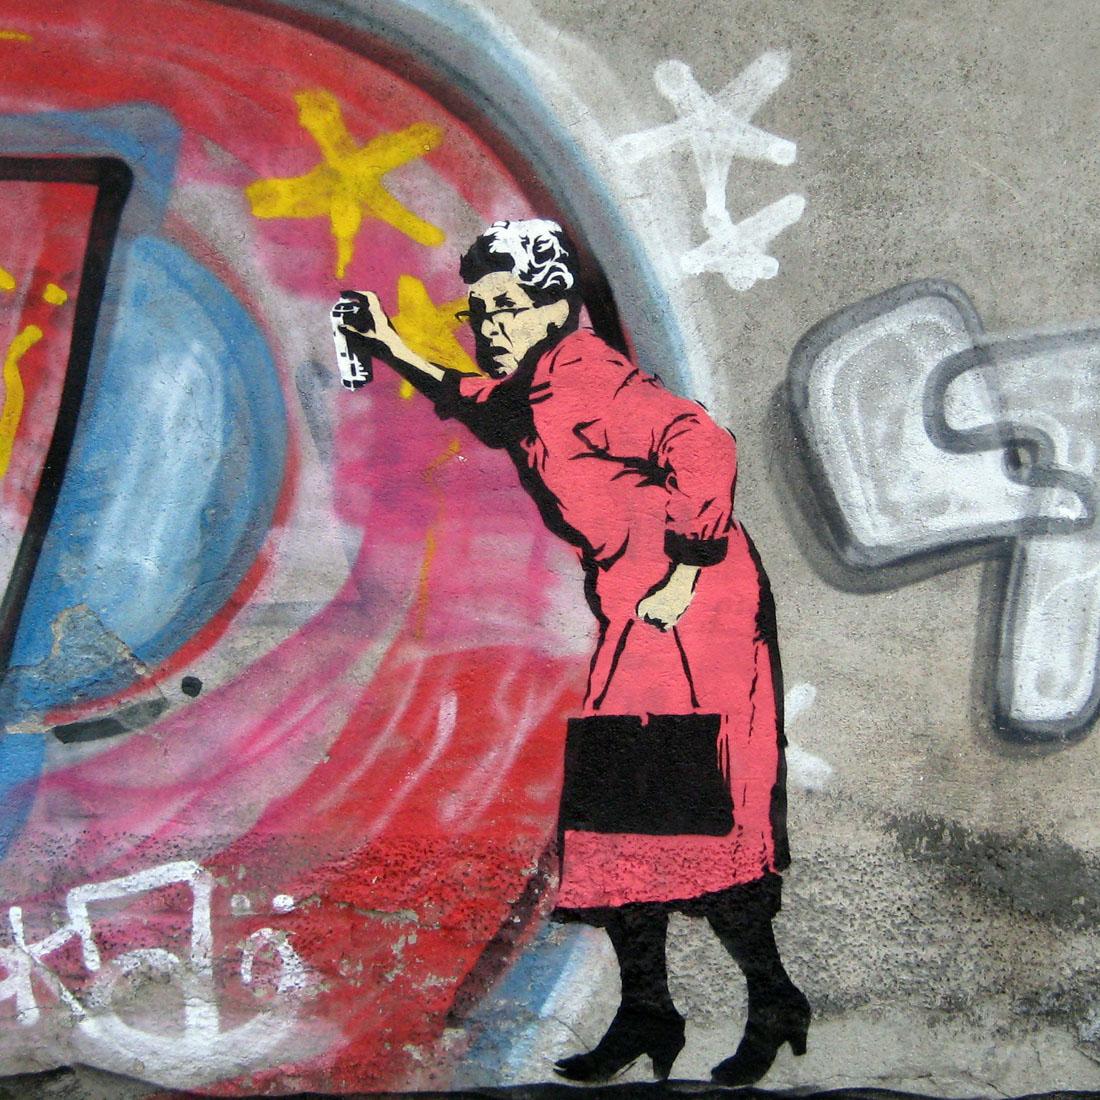 oude vrouw bezig met graffiti